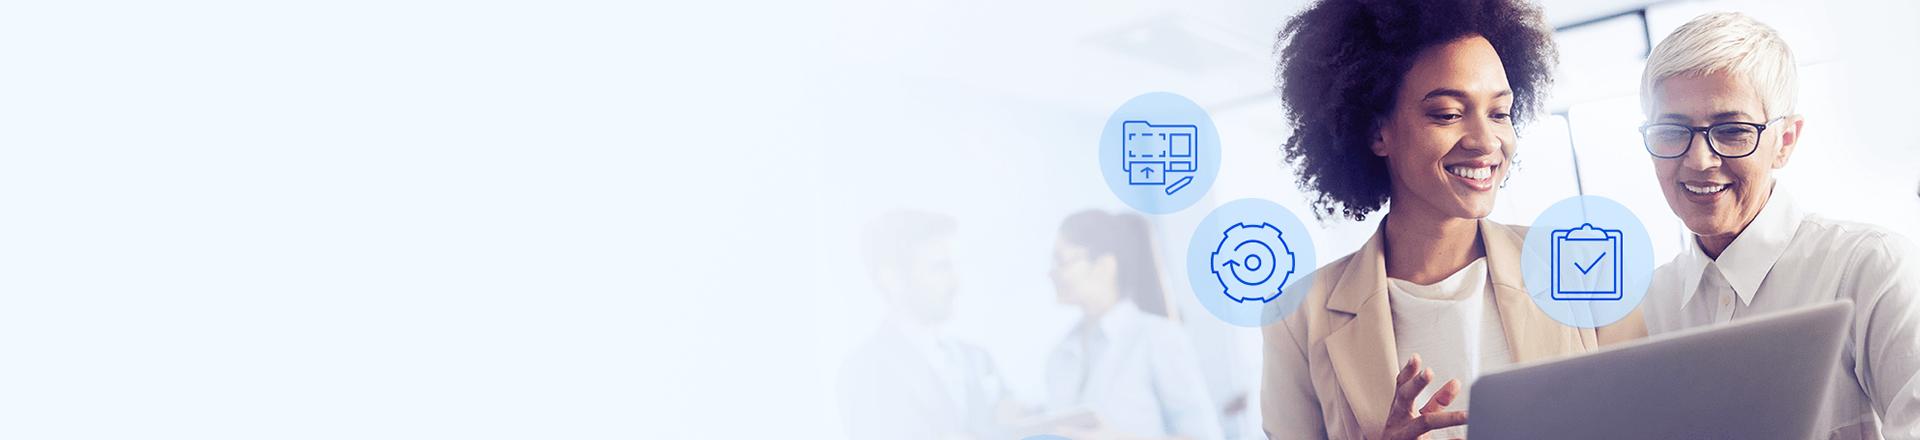 Sitefinity Webinar Tailor Personalization